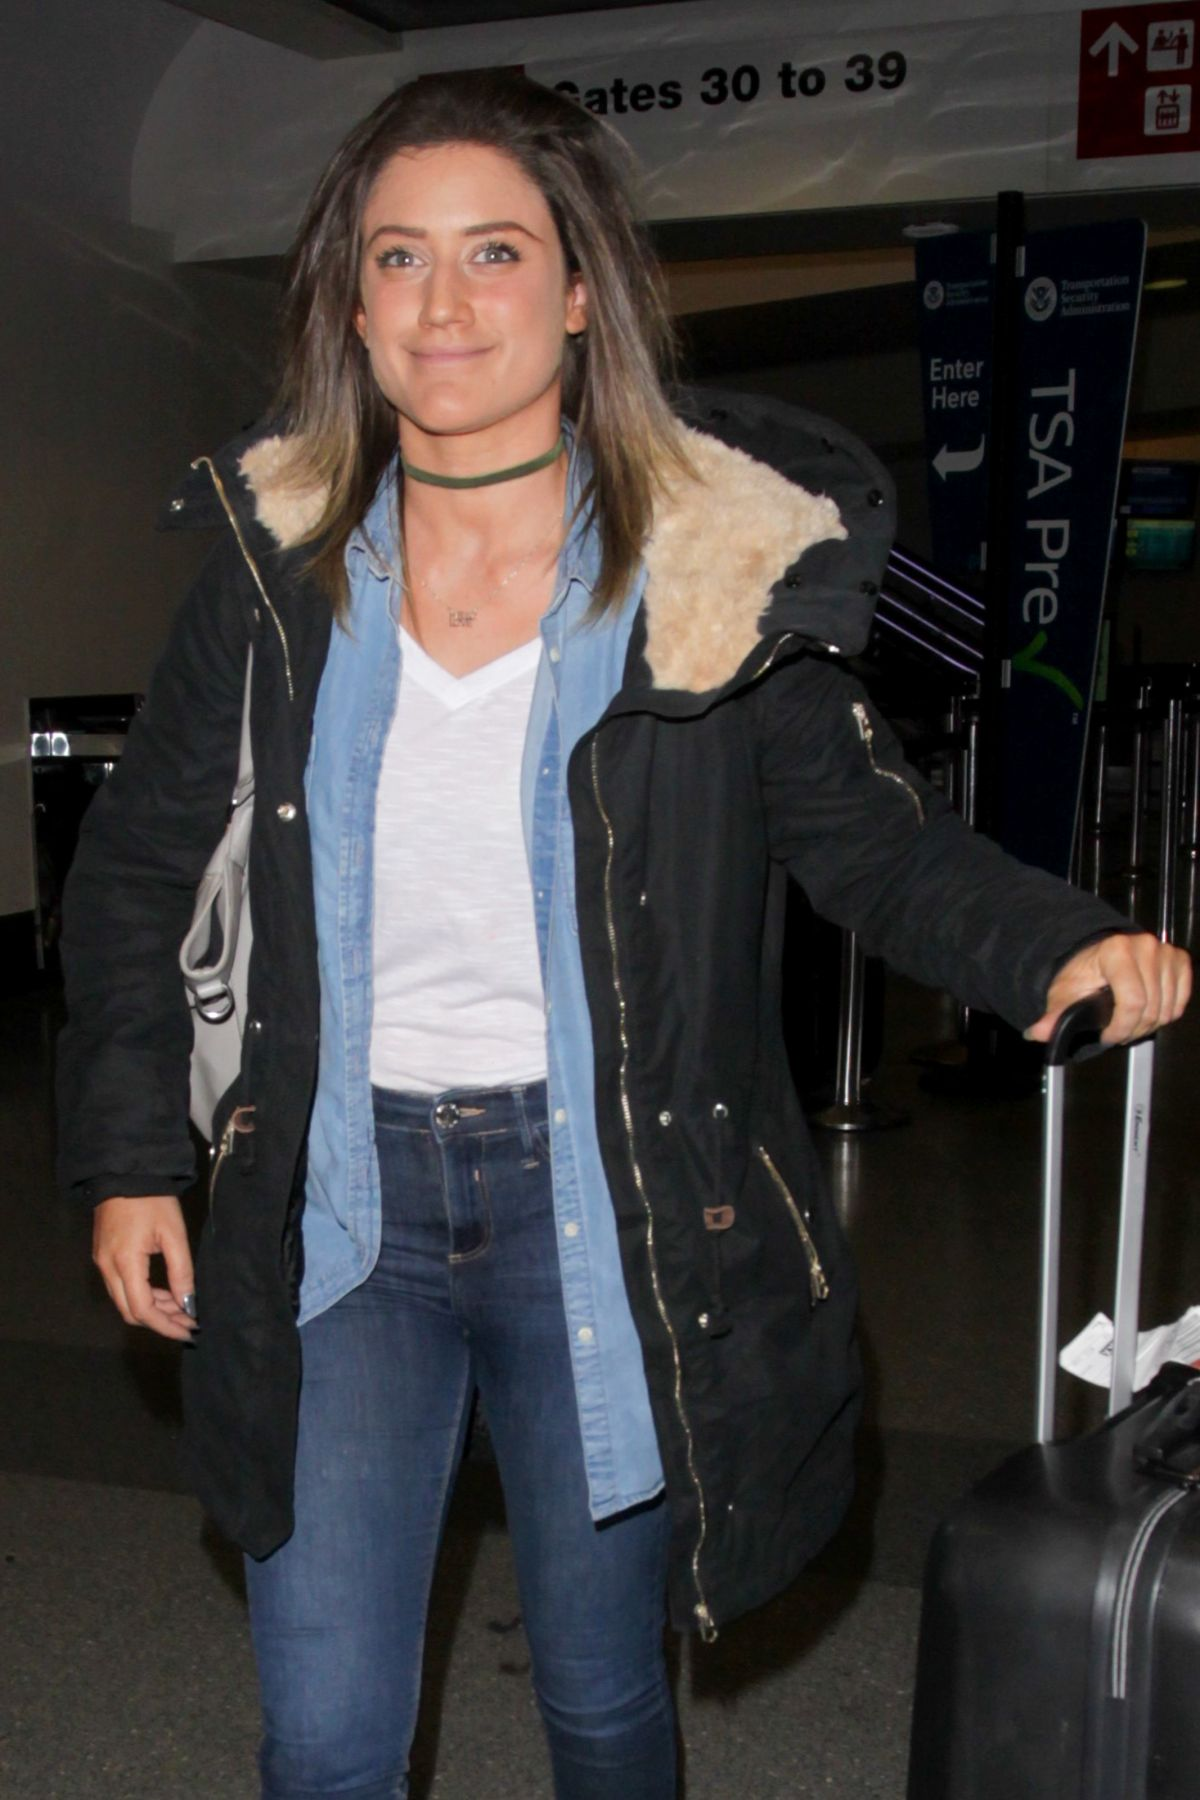 KATIE WAISSEL at Los Angeles International Airport 02/10/2017